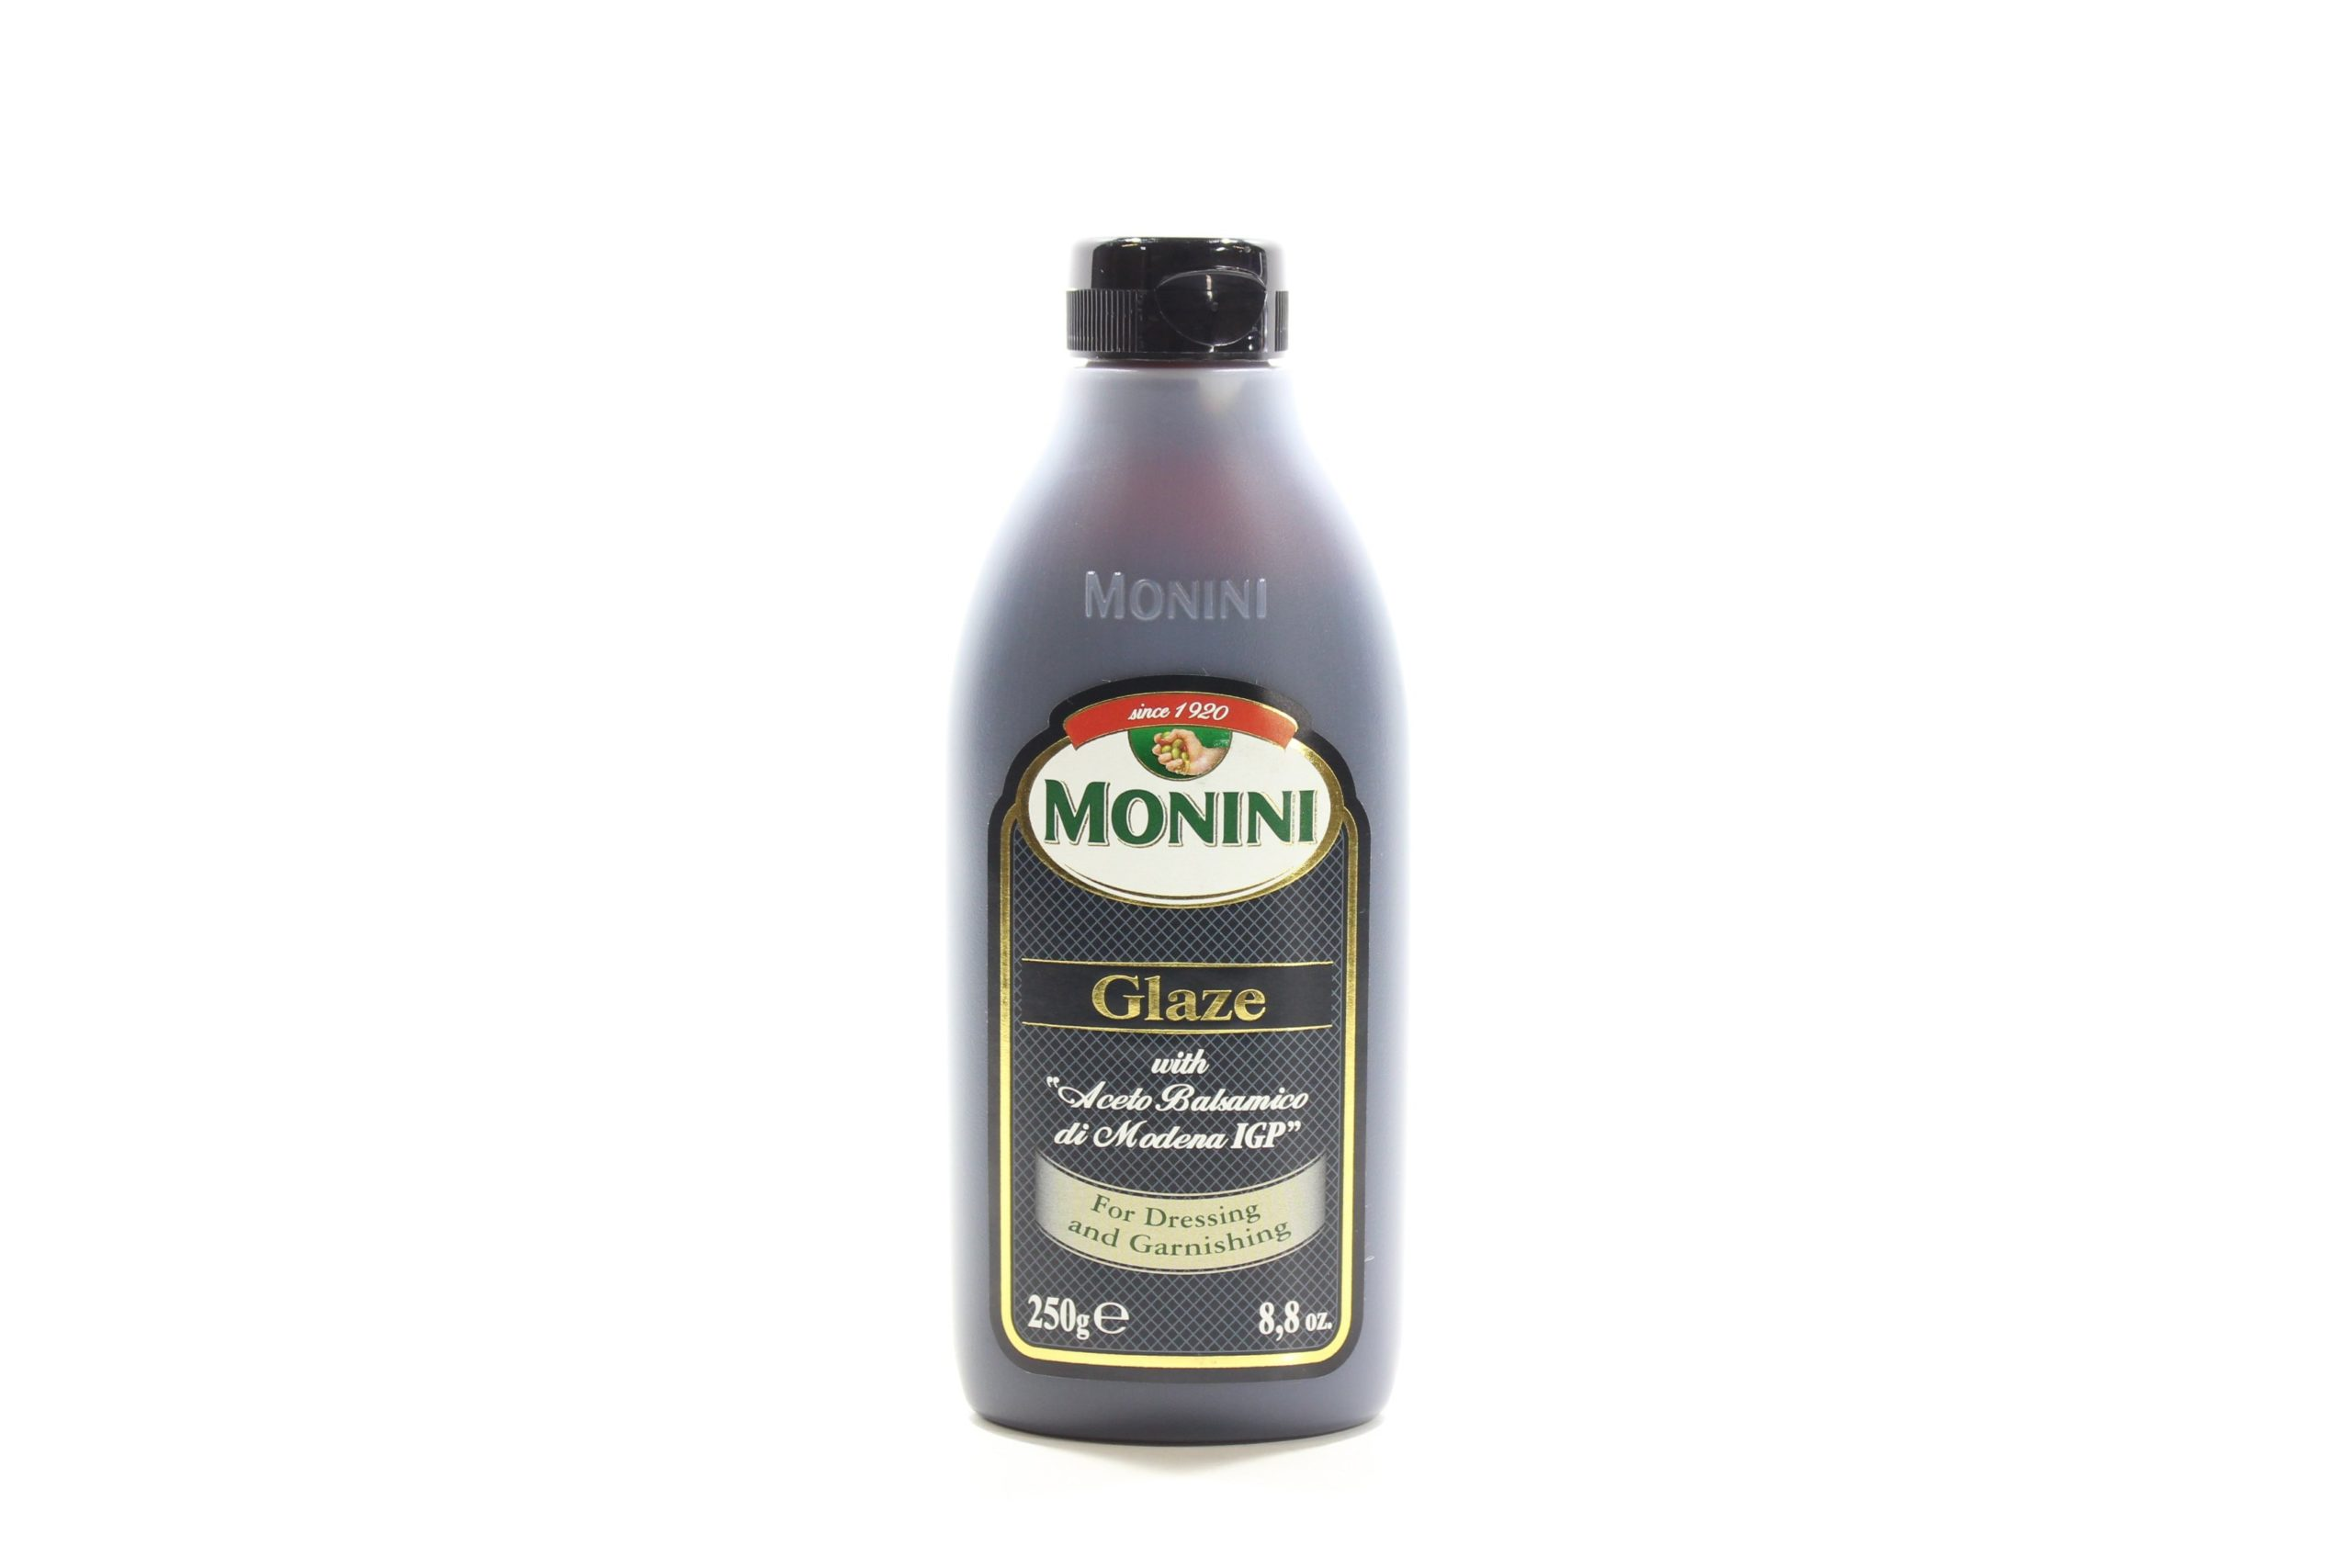 Monini Glaze